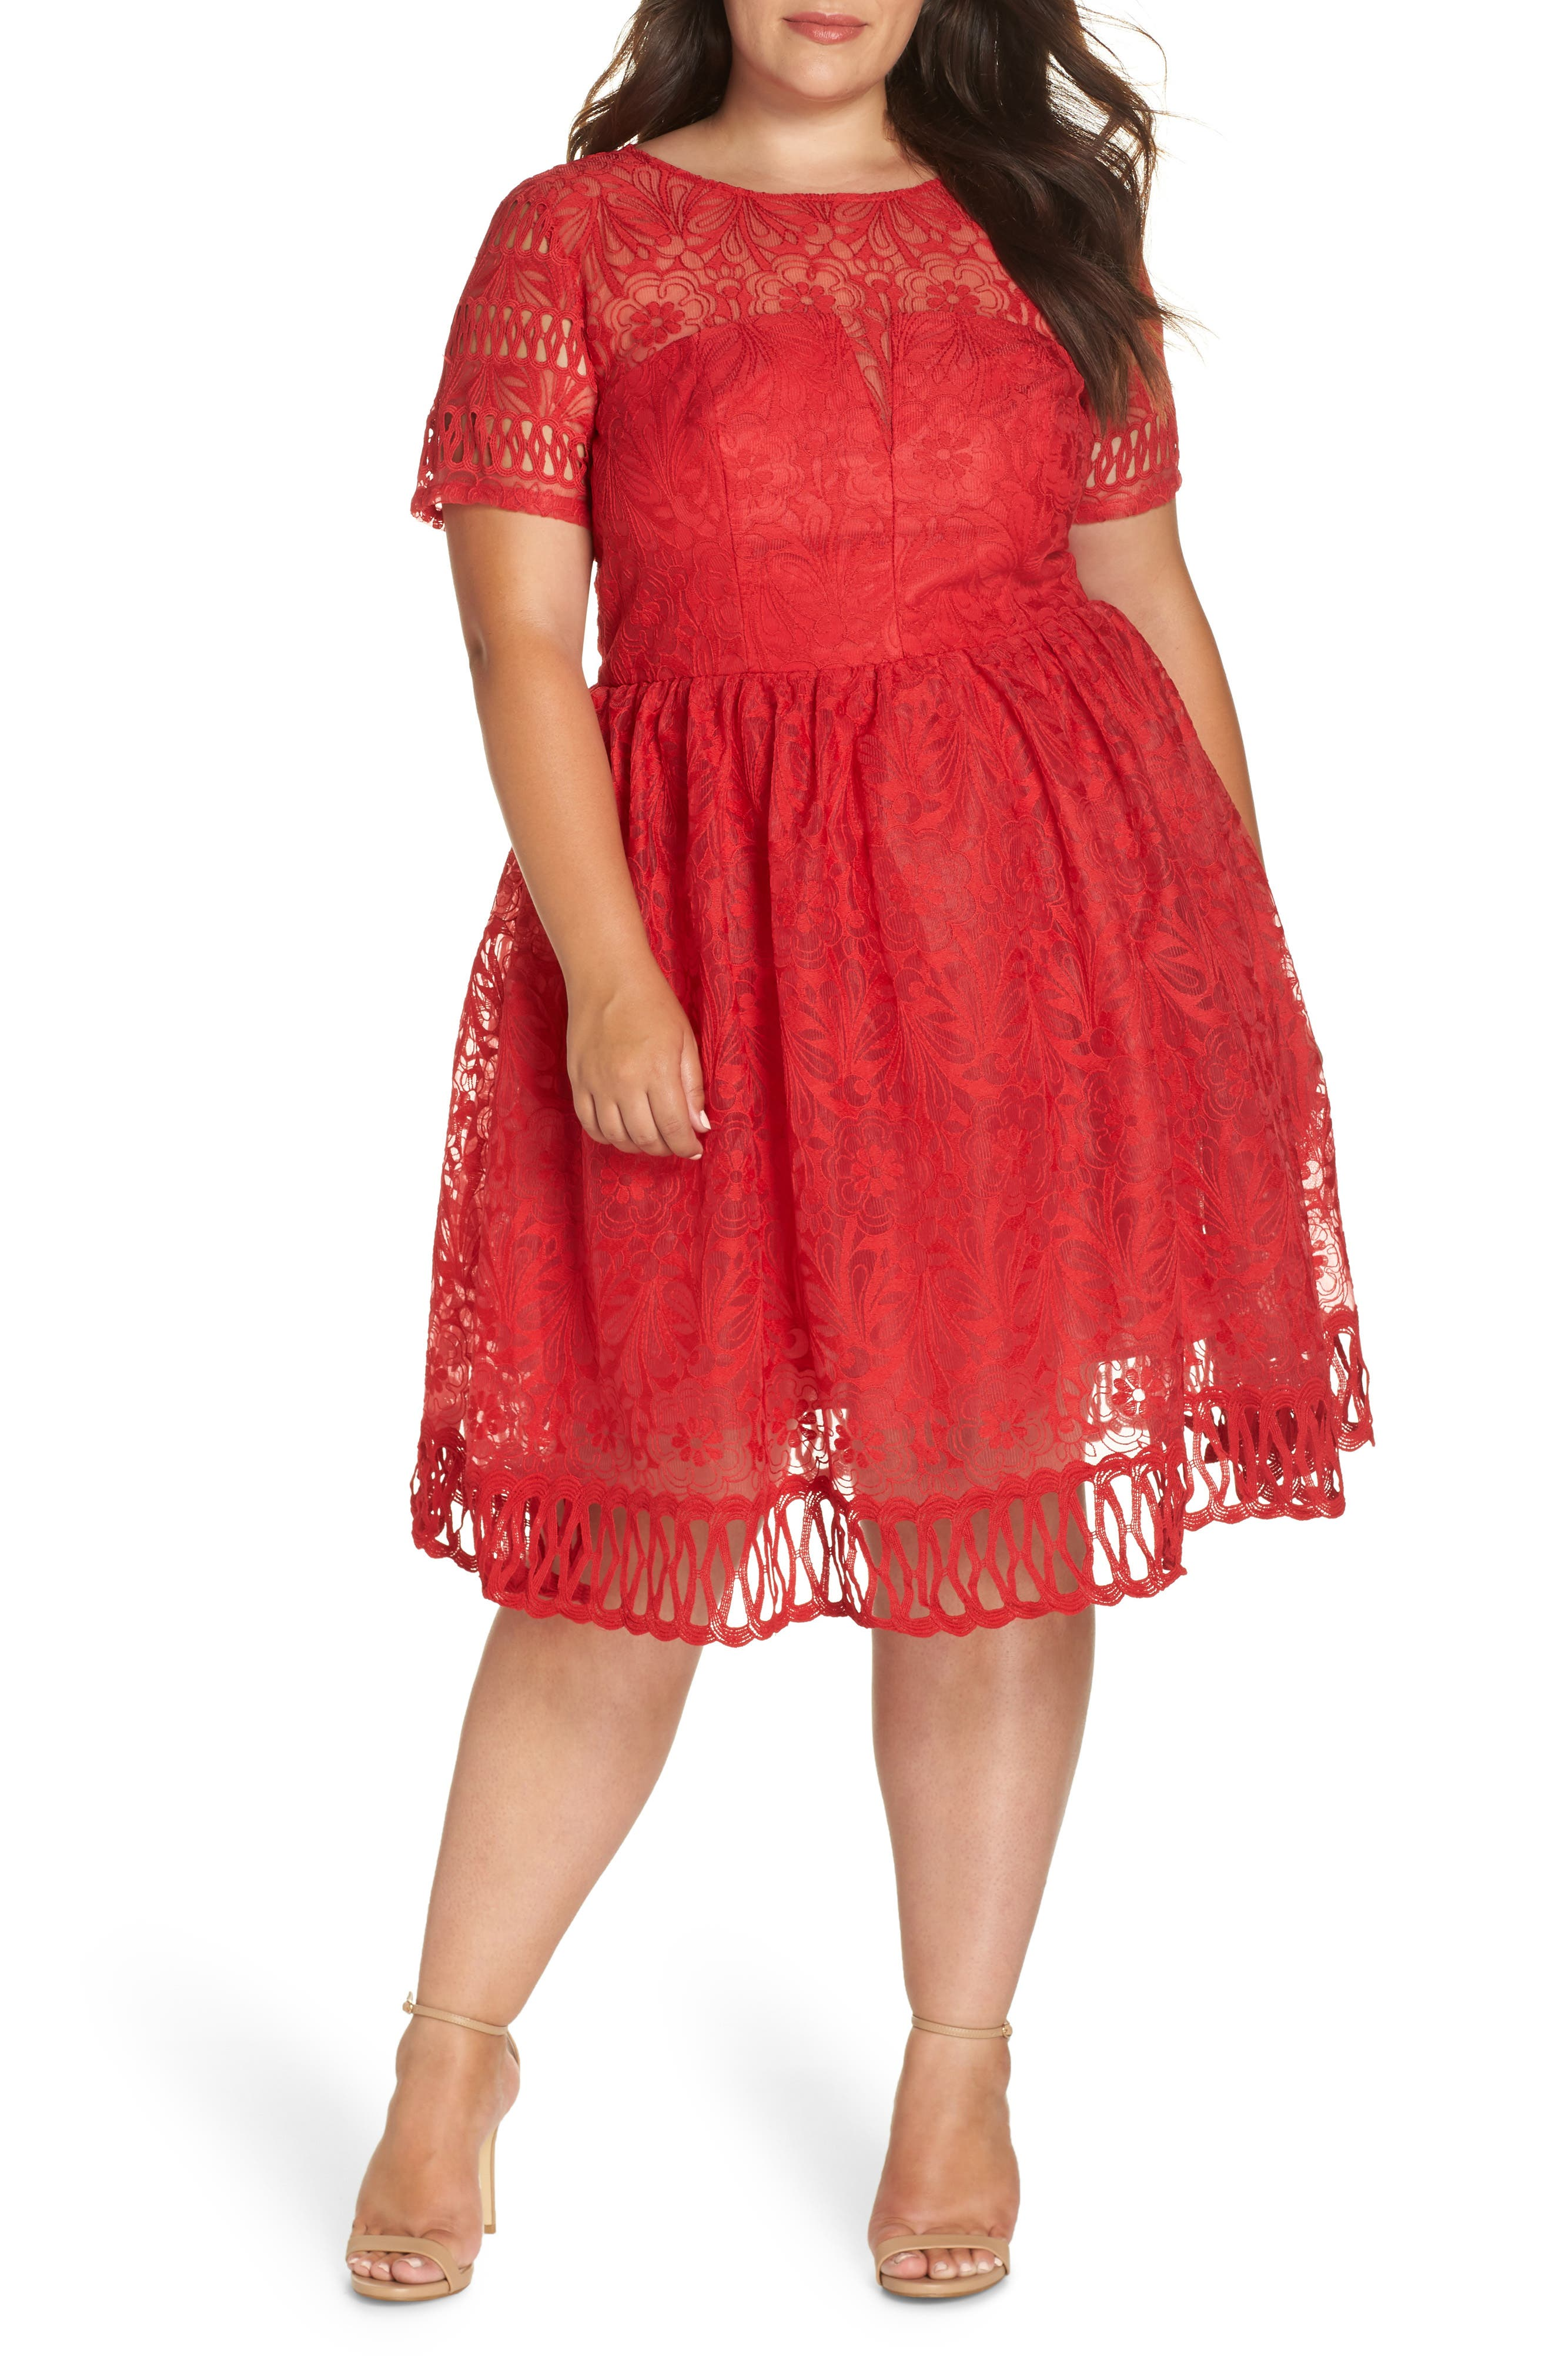 CHI CHI LONDON, Crochet Dress, Main thumbnail 1, color, RED